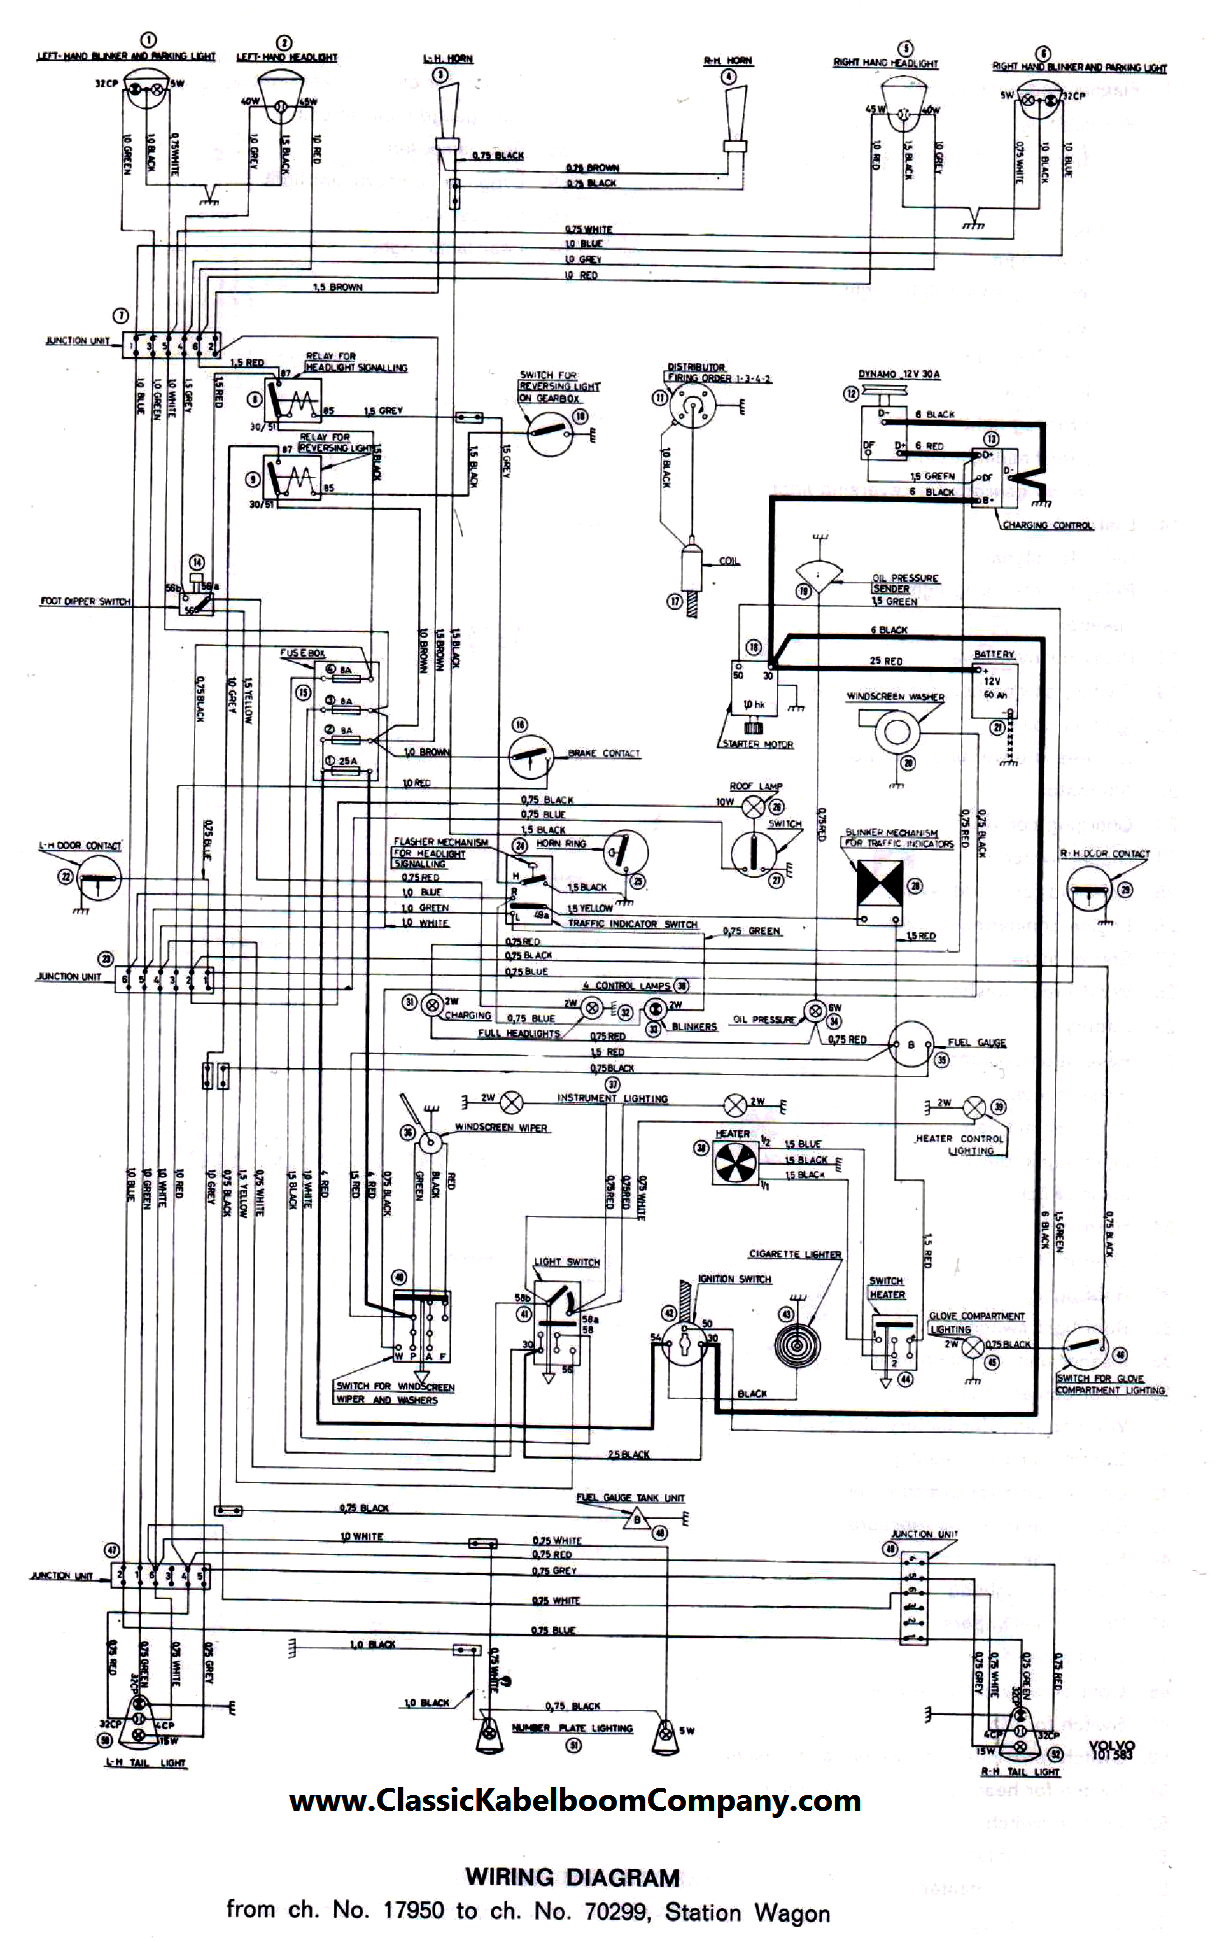 vol11?cdp=a classic kabelboom company elektrisch bedrading schema volvo volvo amazon wiring diagram at soozxer.org